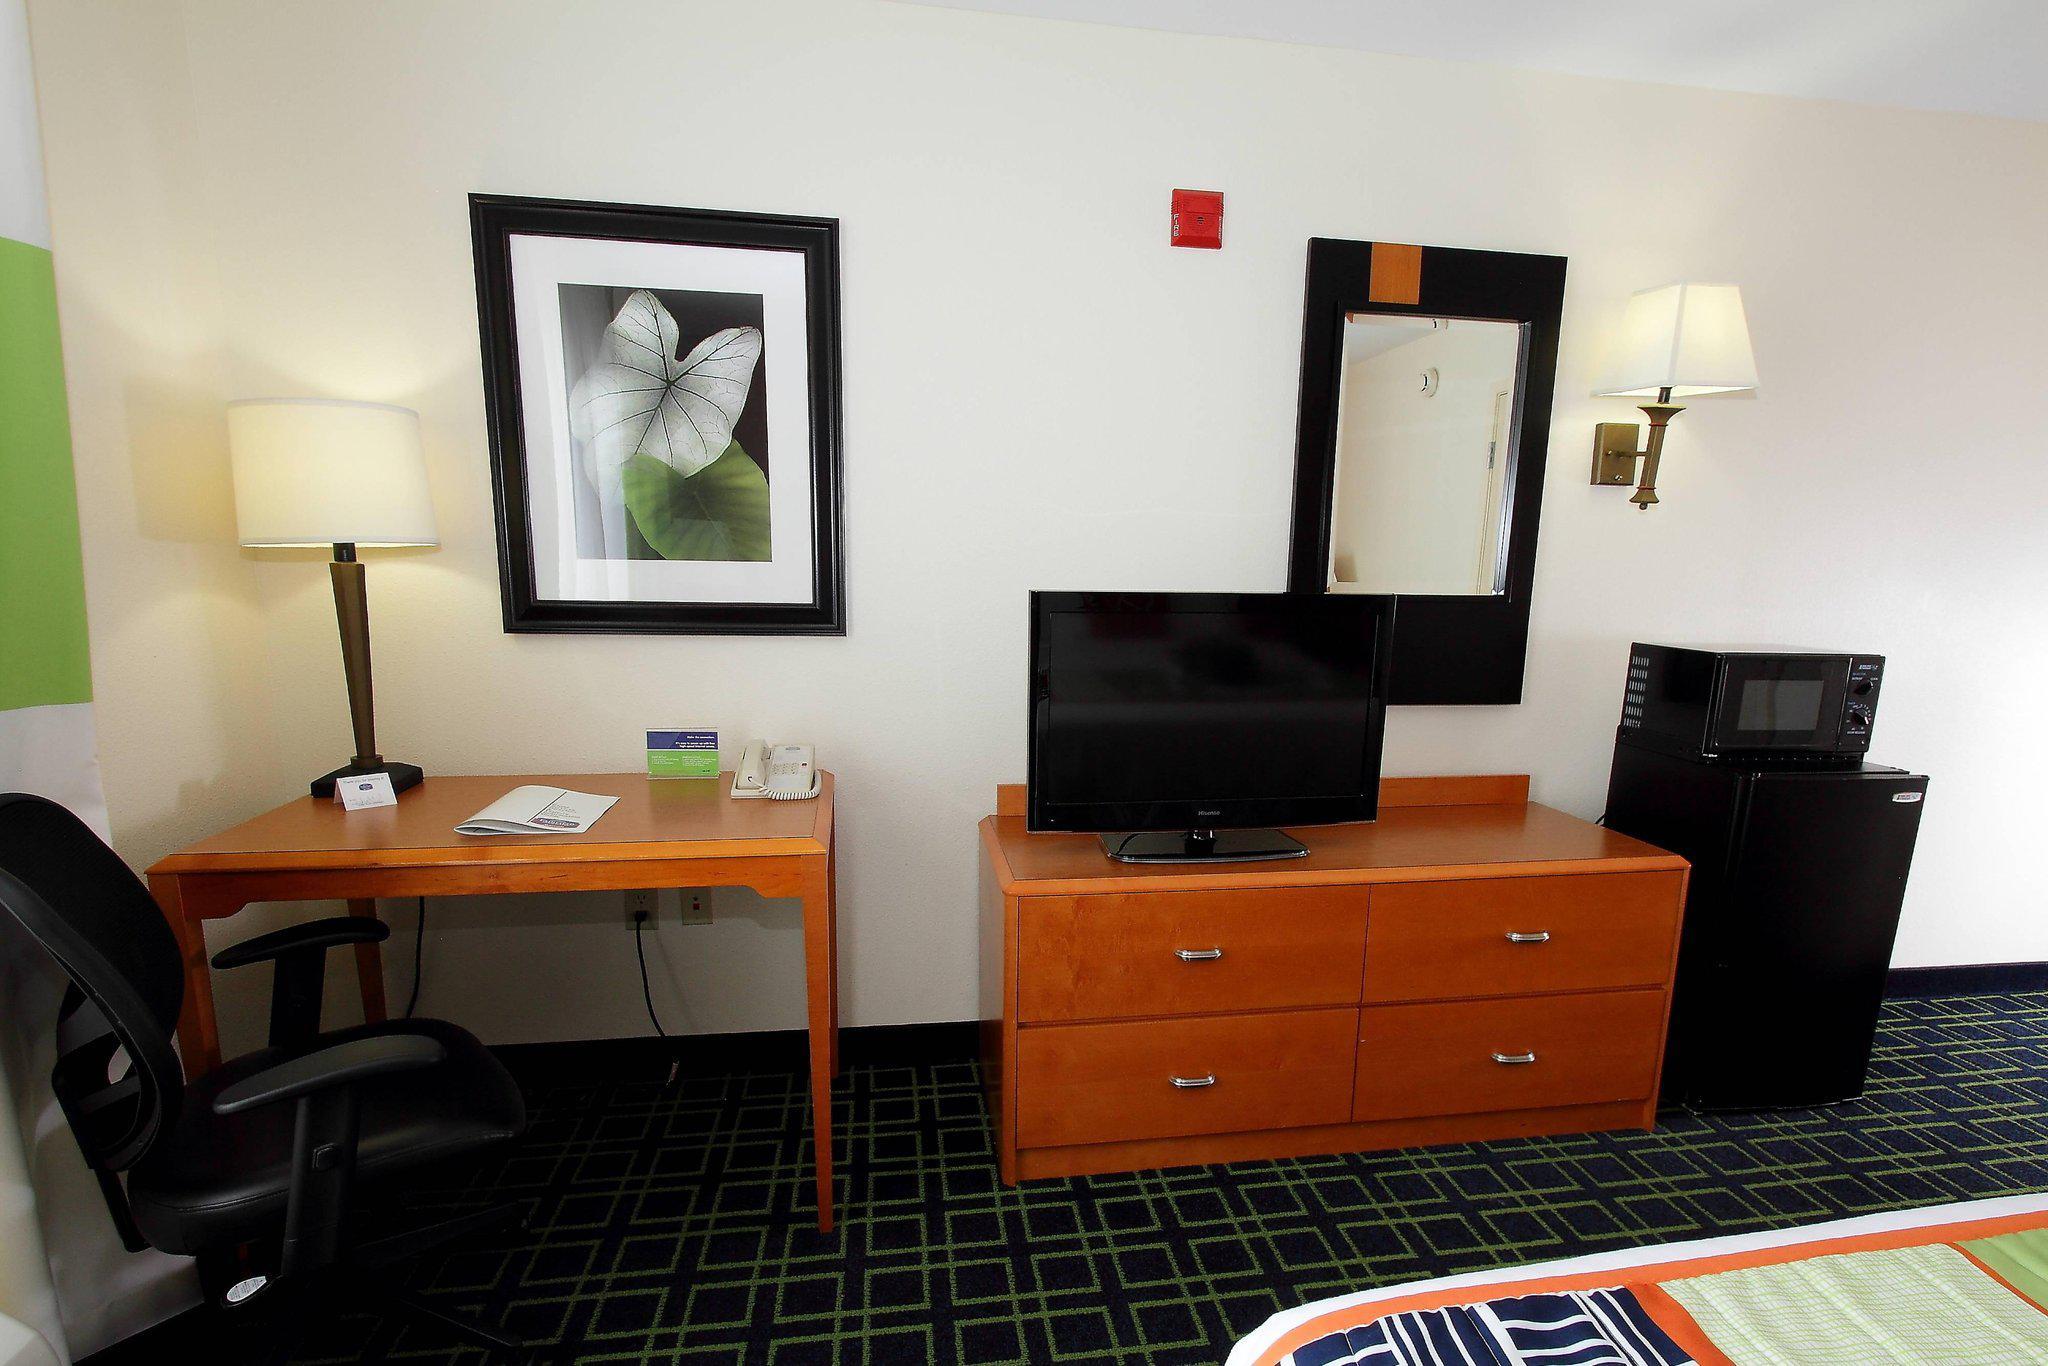 Fairfield Inn & Suites by Marriott Killeen